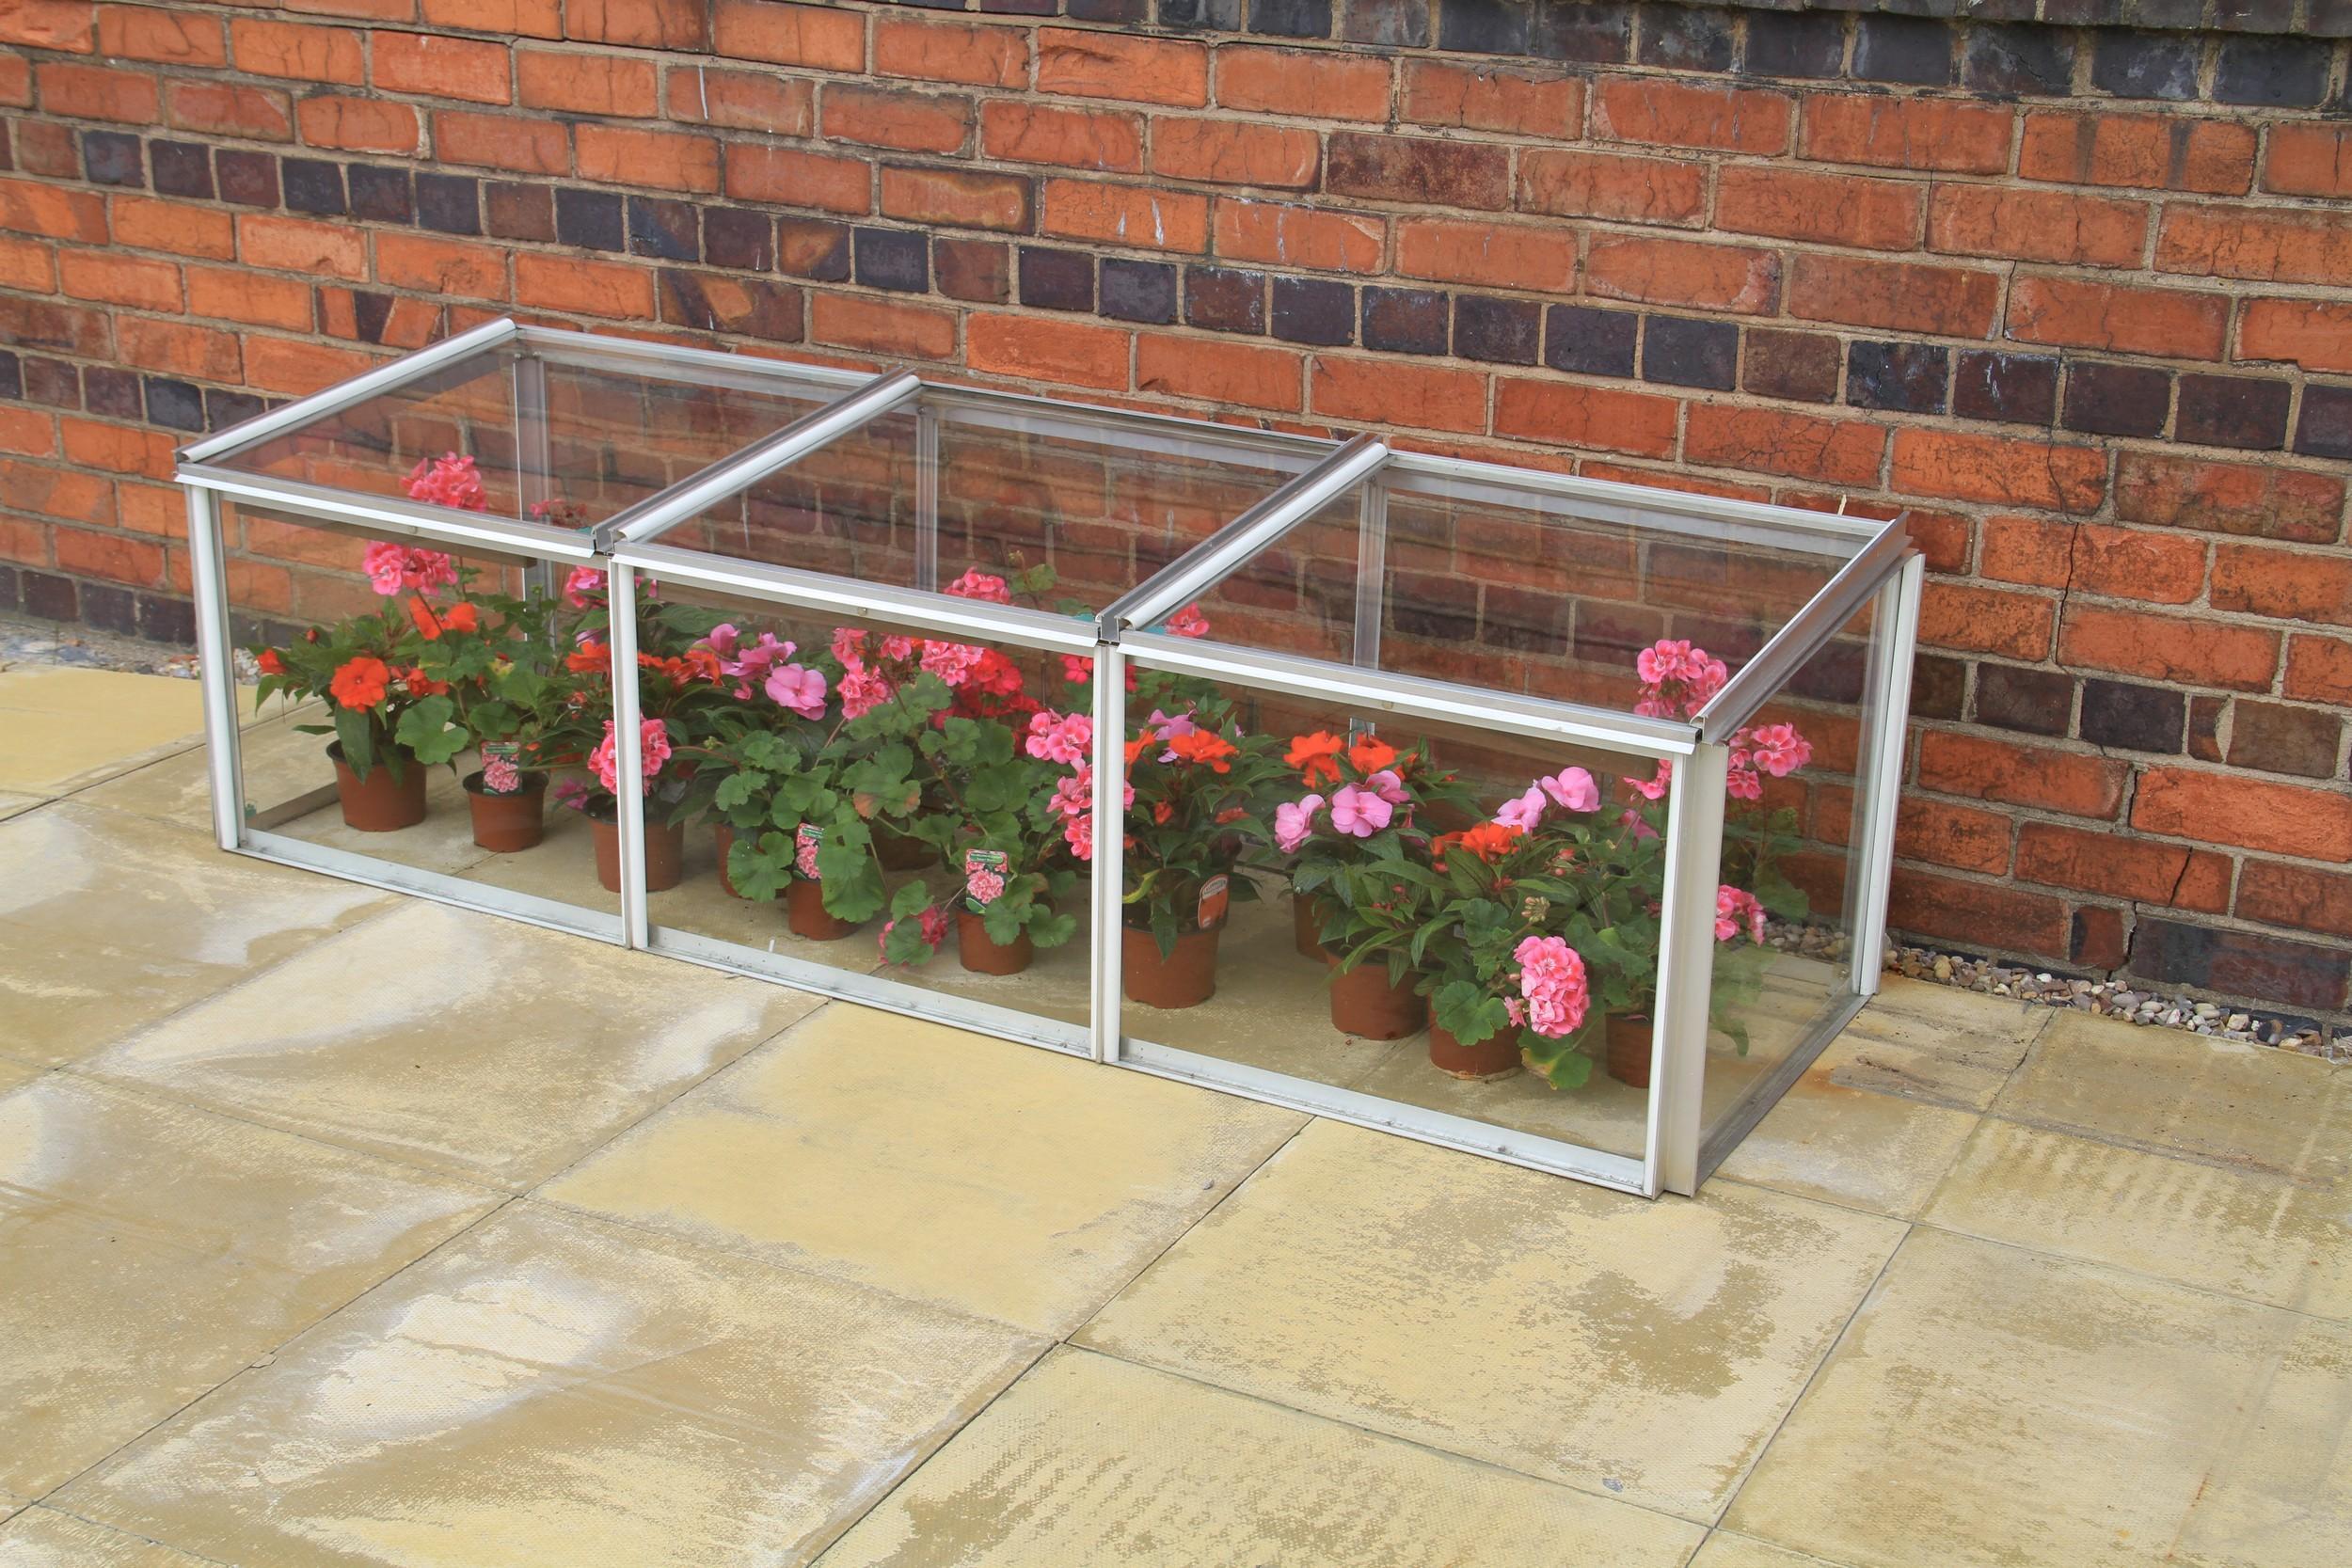 simplicity cold frame 2ftx6ft mini greenhouse toughened. Black Bedroom Furniture Sets. Home Design Ideas